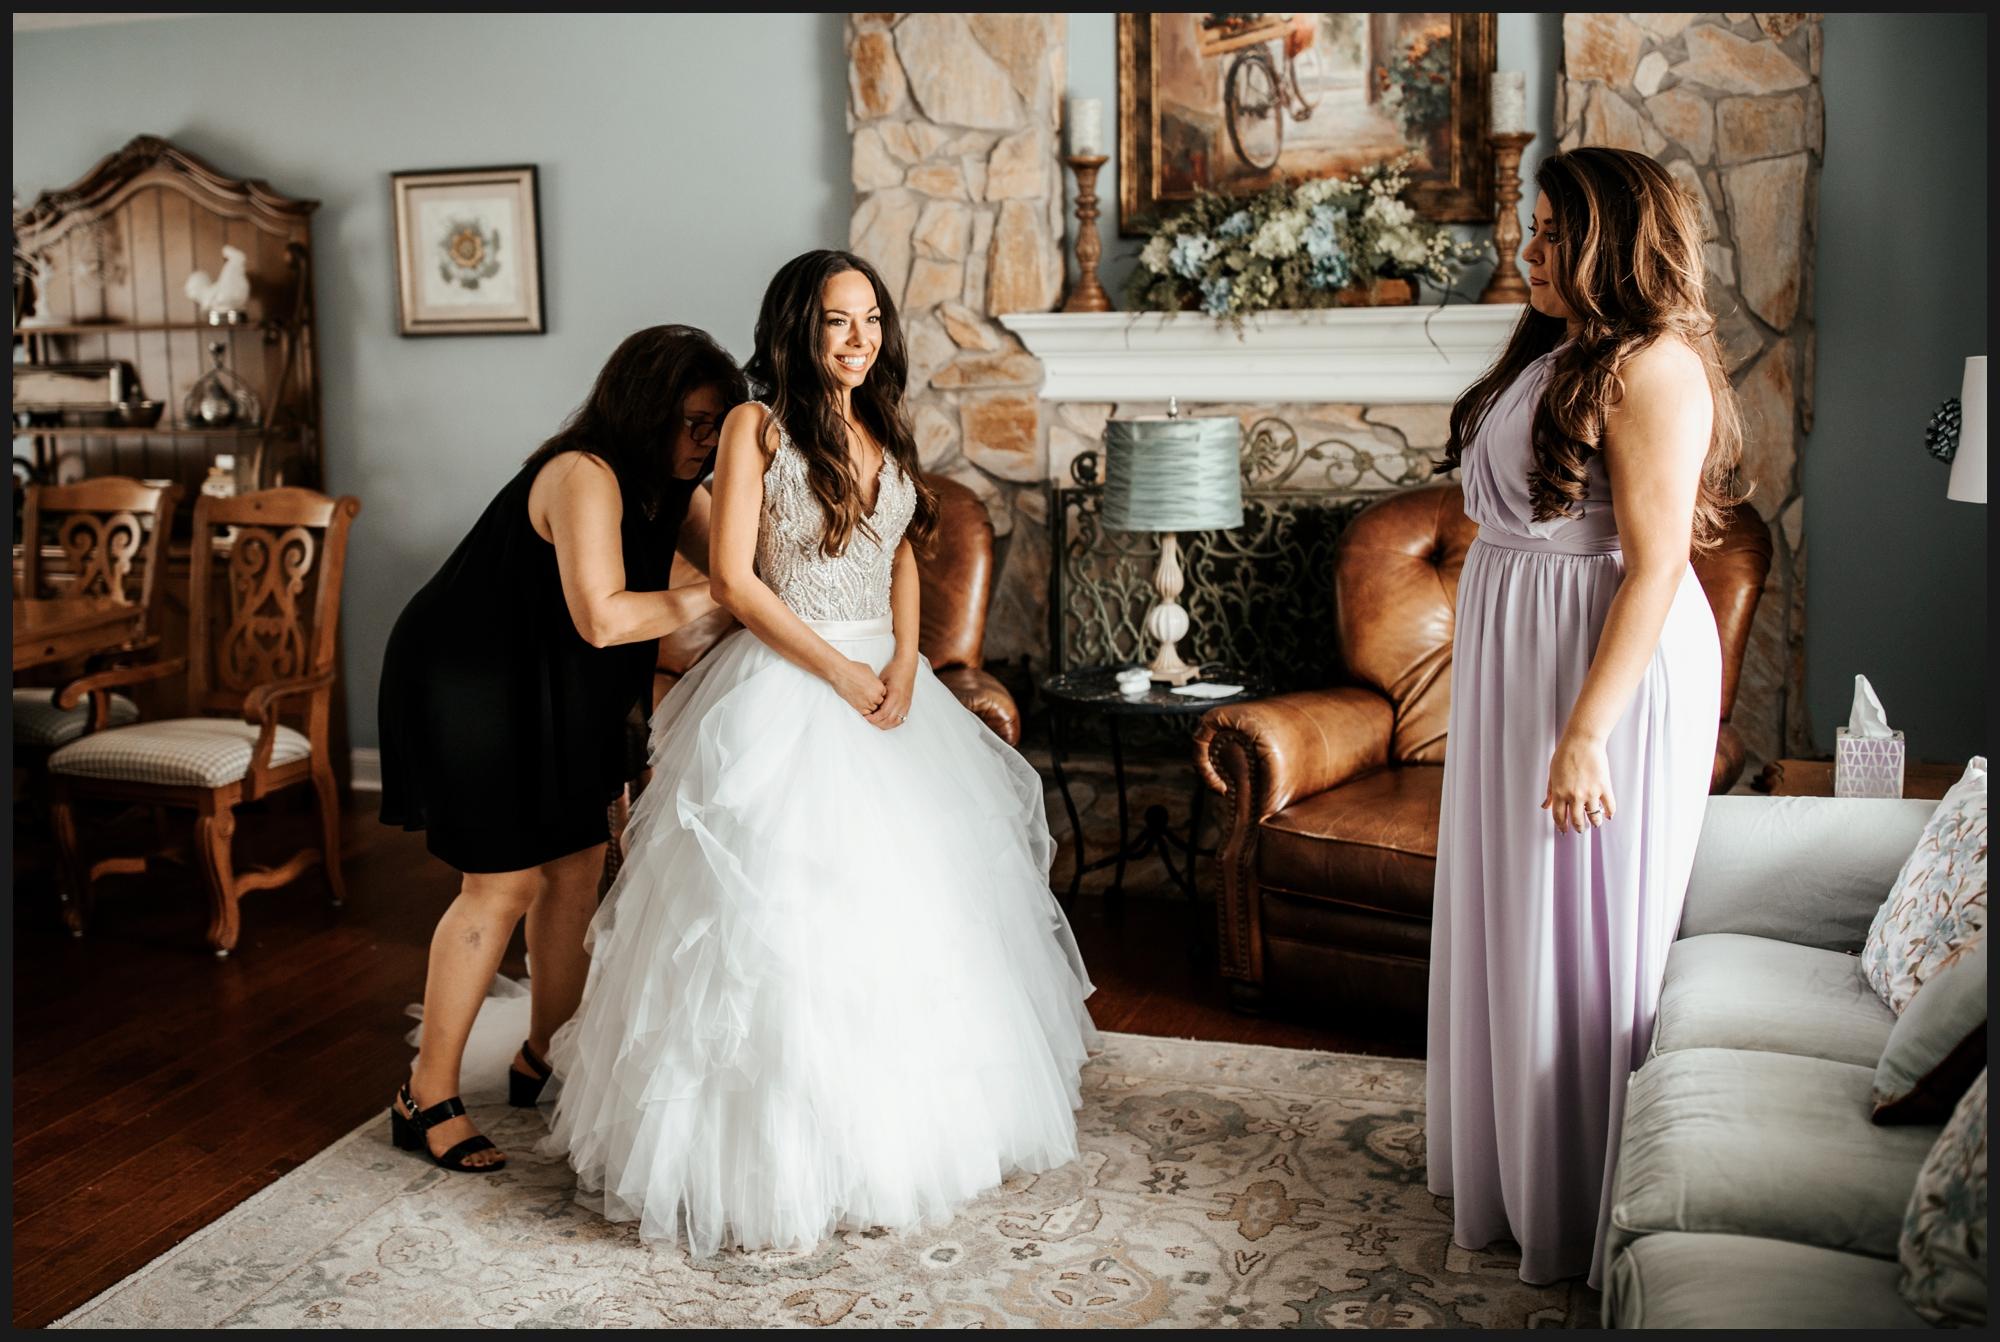 Orlando-Wedding-Photographer-destination-wedding-photographer-florida-wedding-photographer-bohemian-wedding-photographer_1580.jpg